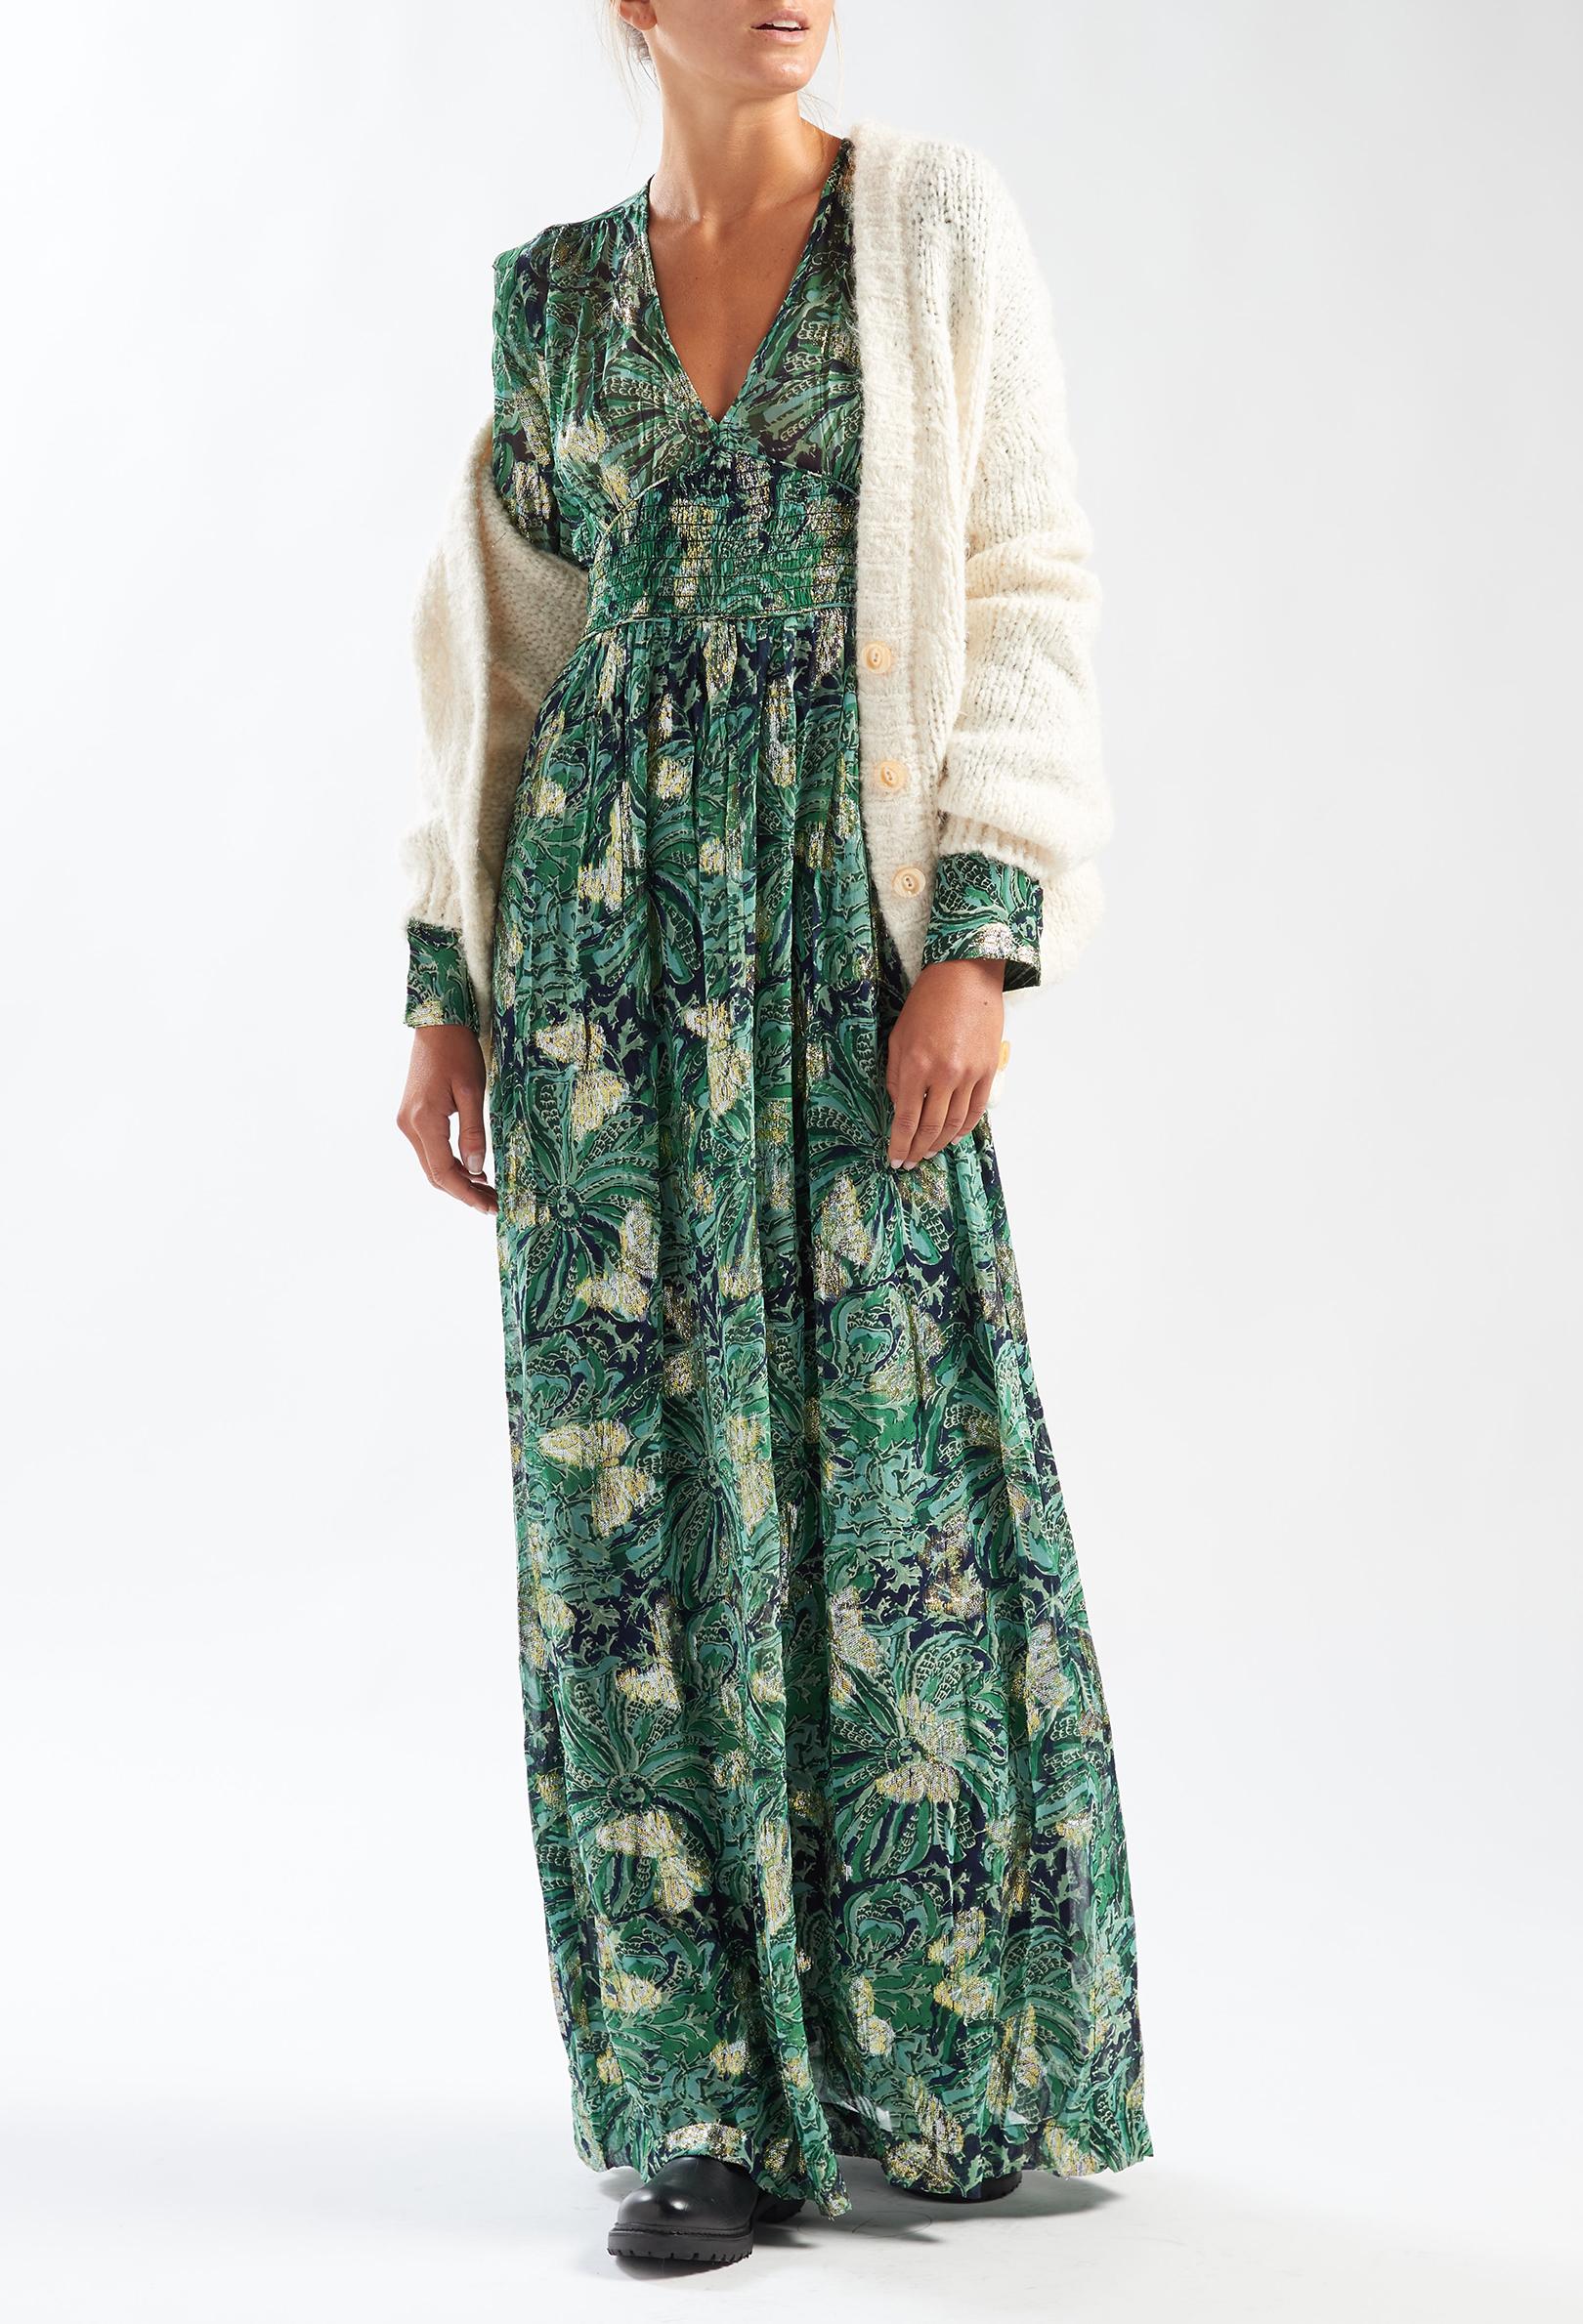 Greens - Look 3